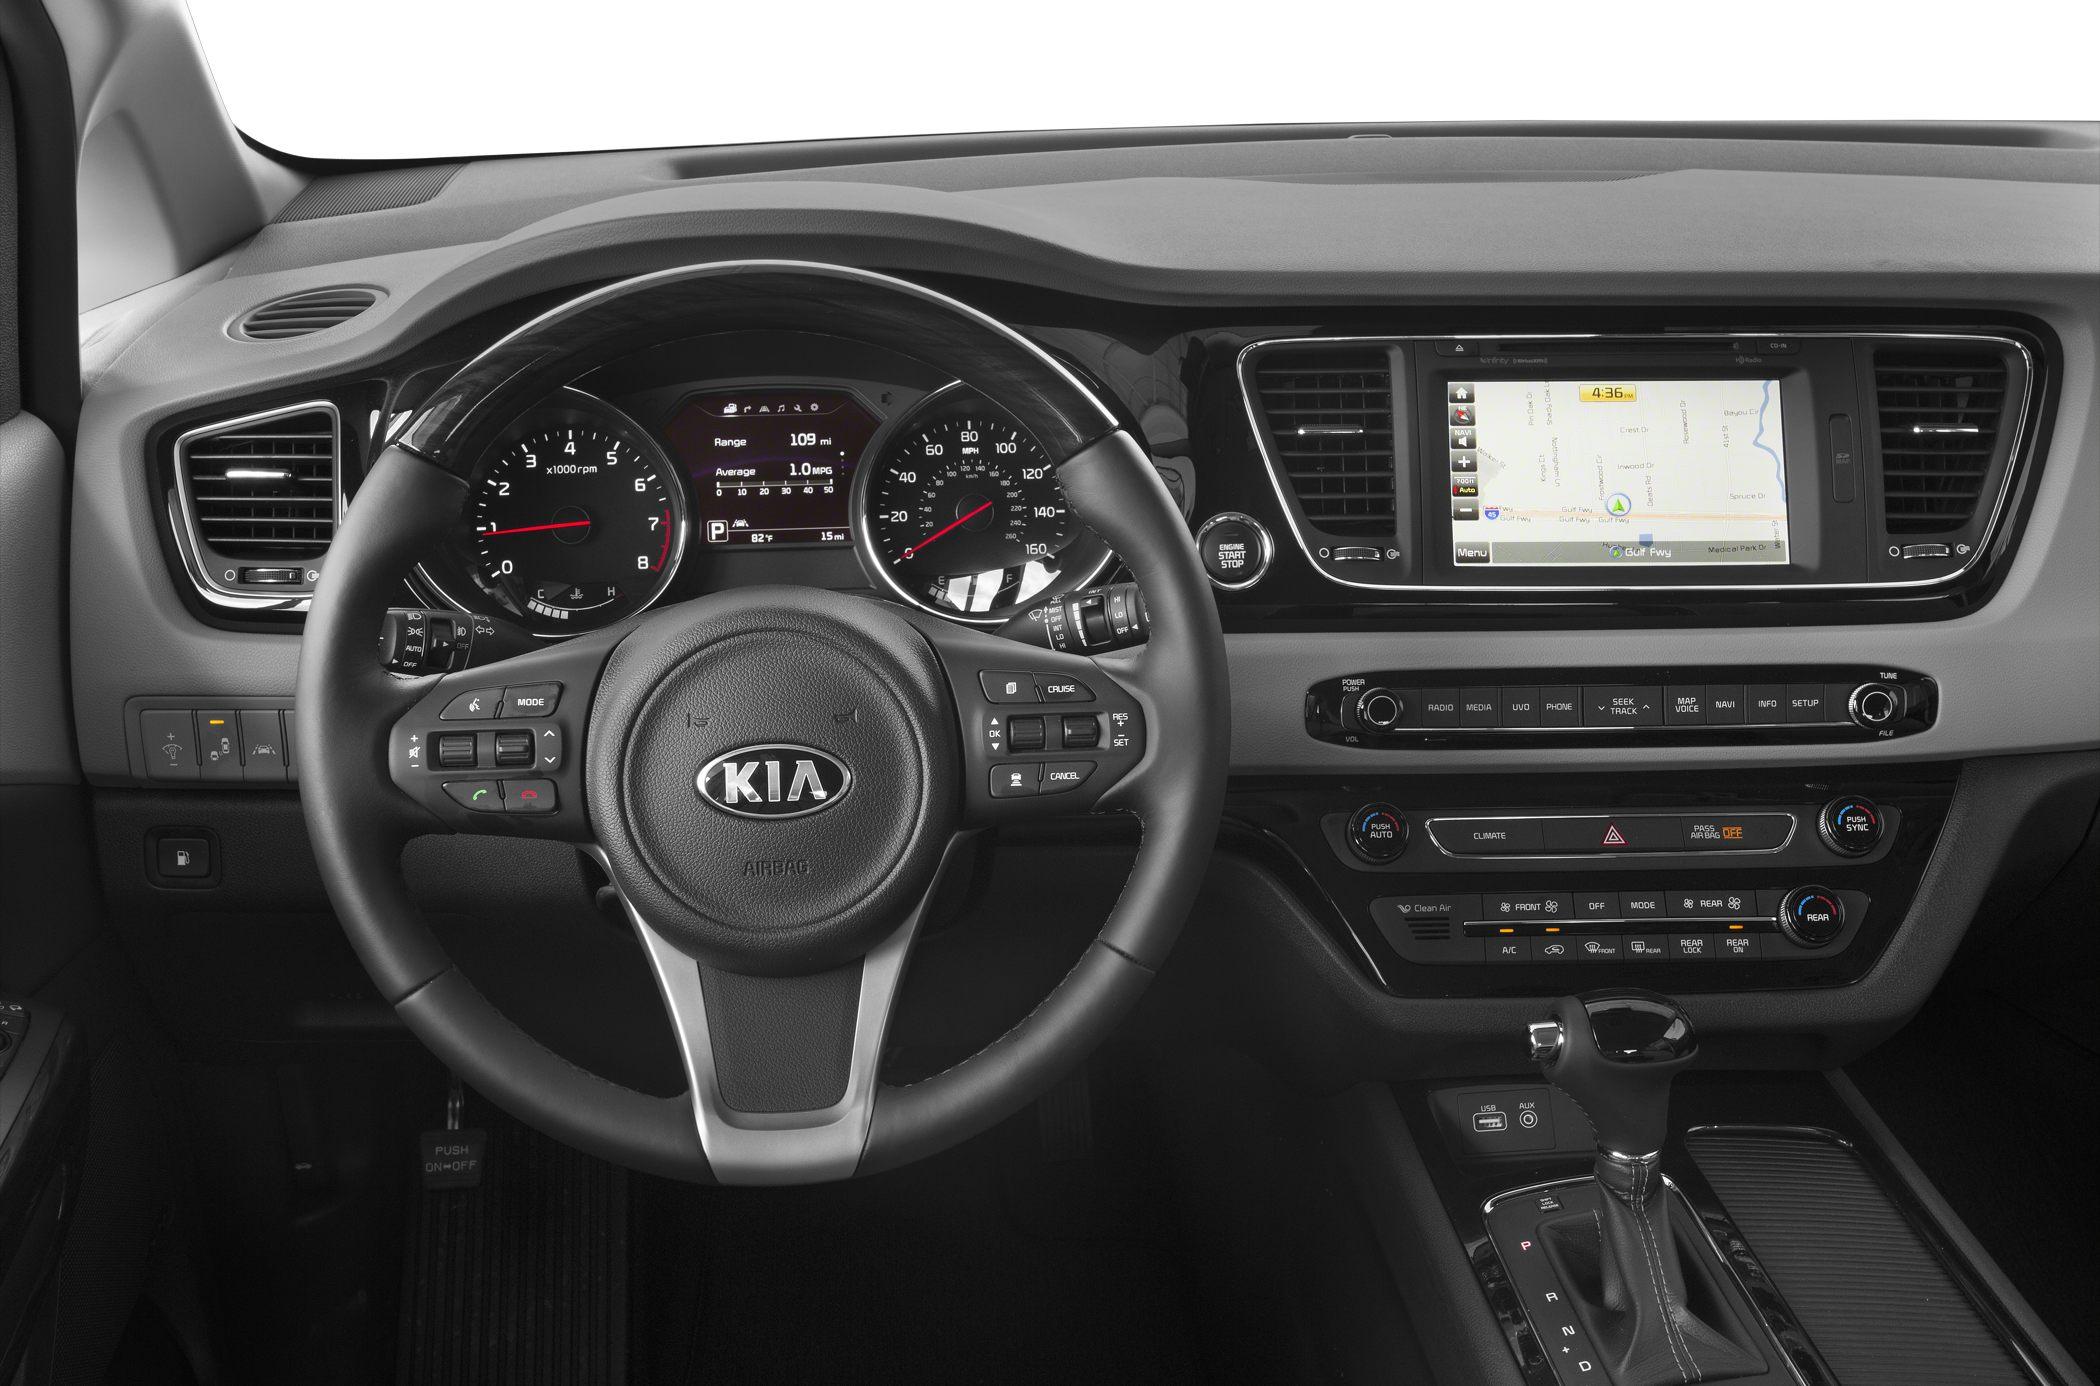 2018 Kia Sedona For Sale In Hebbville Forbes Bridgewater Dash Sxl